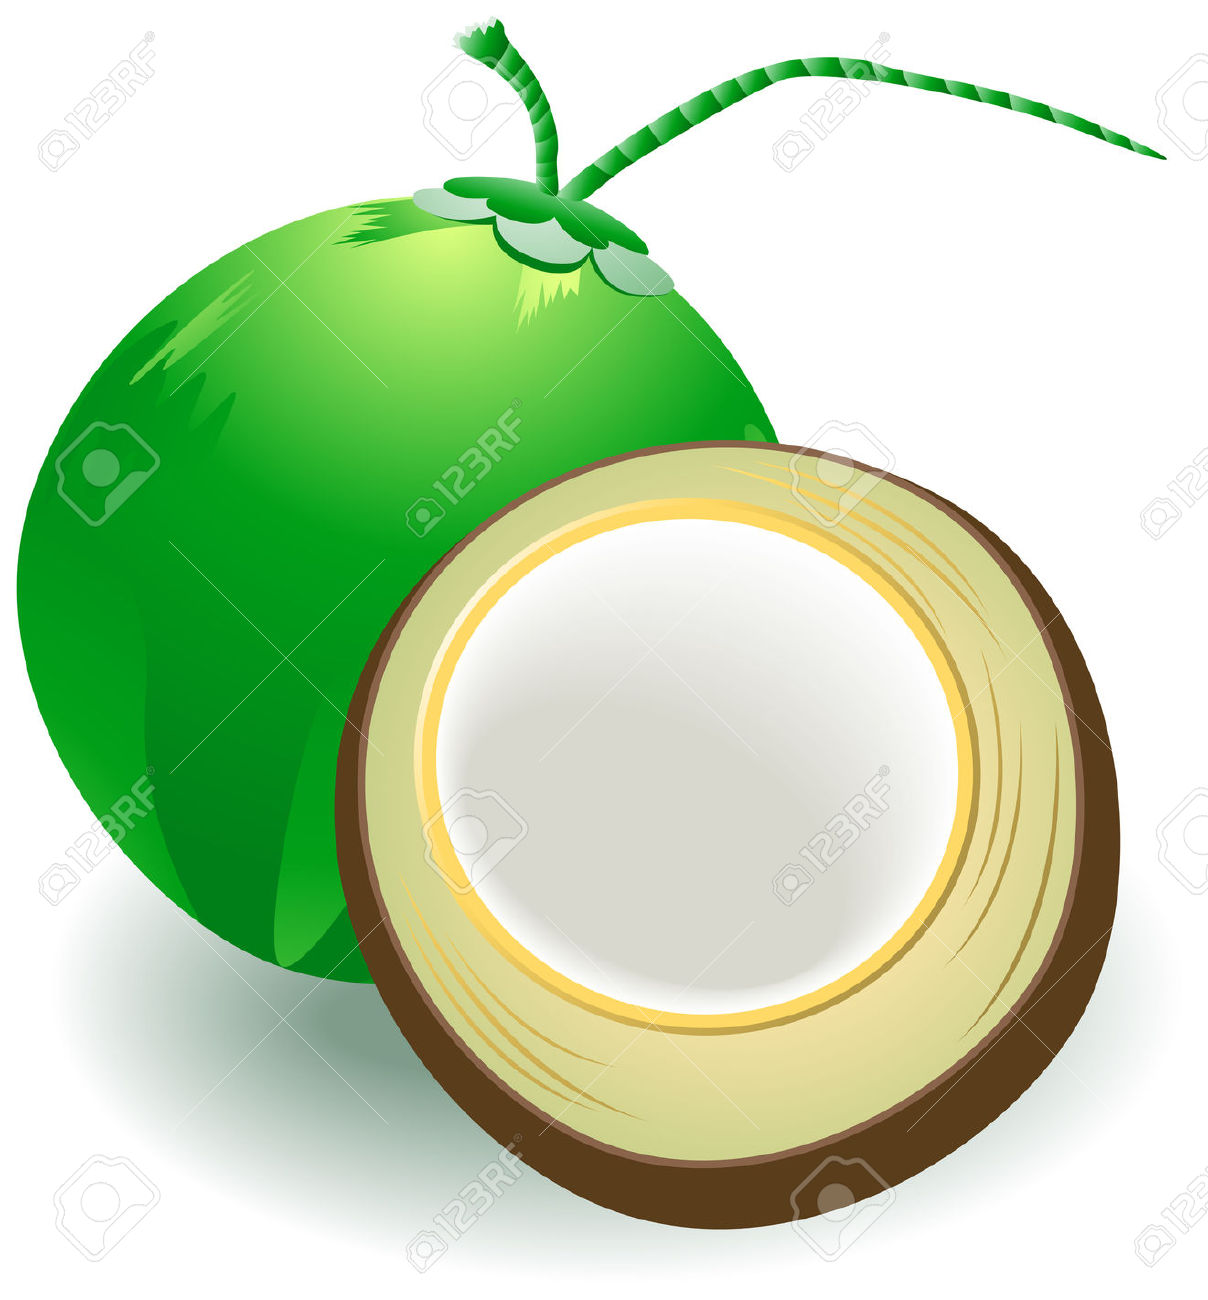 Coconut Bra Clip Art. Coconuts Illustrat-Coconut Bra Clip Art. Coconuts Illustration with .-3